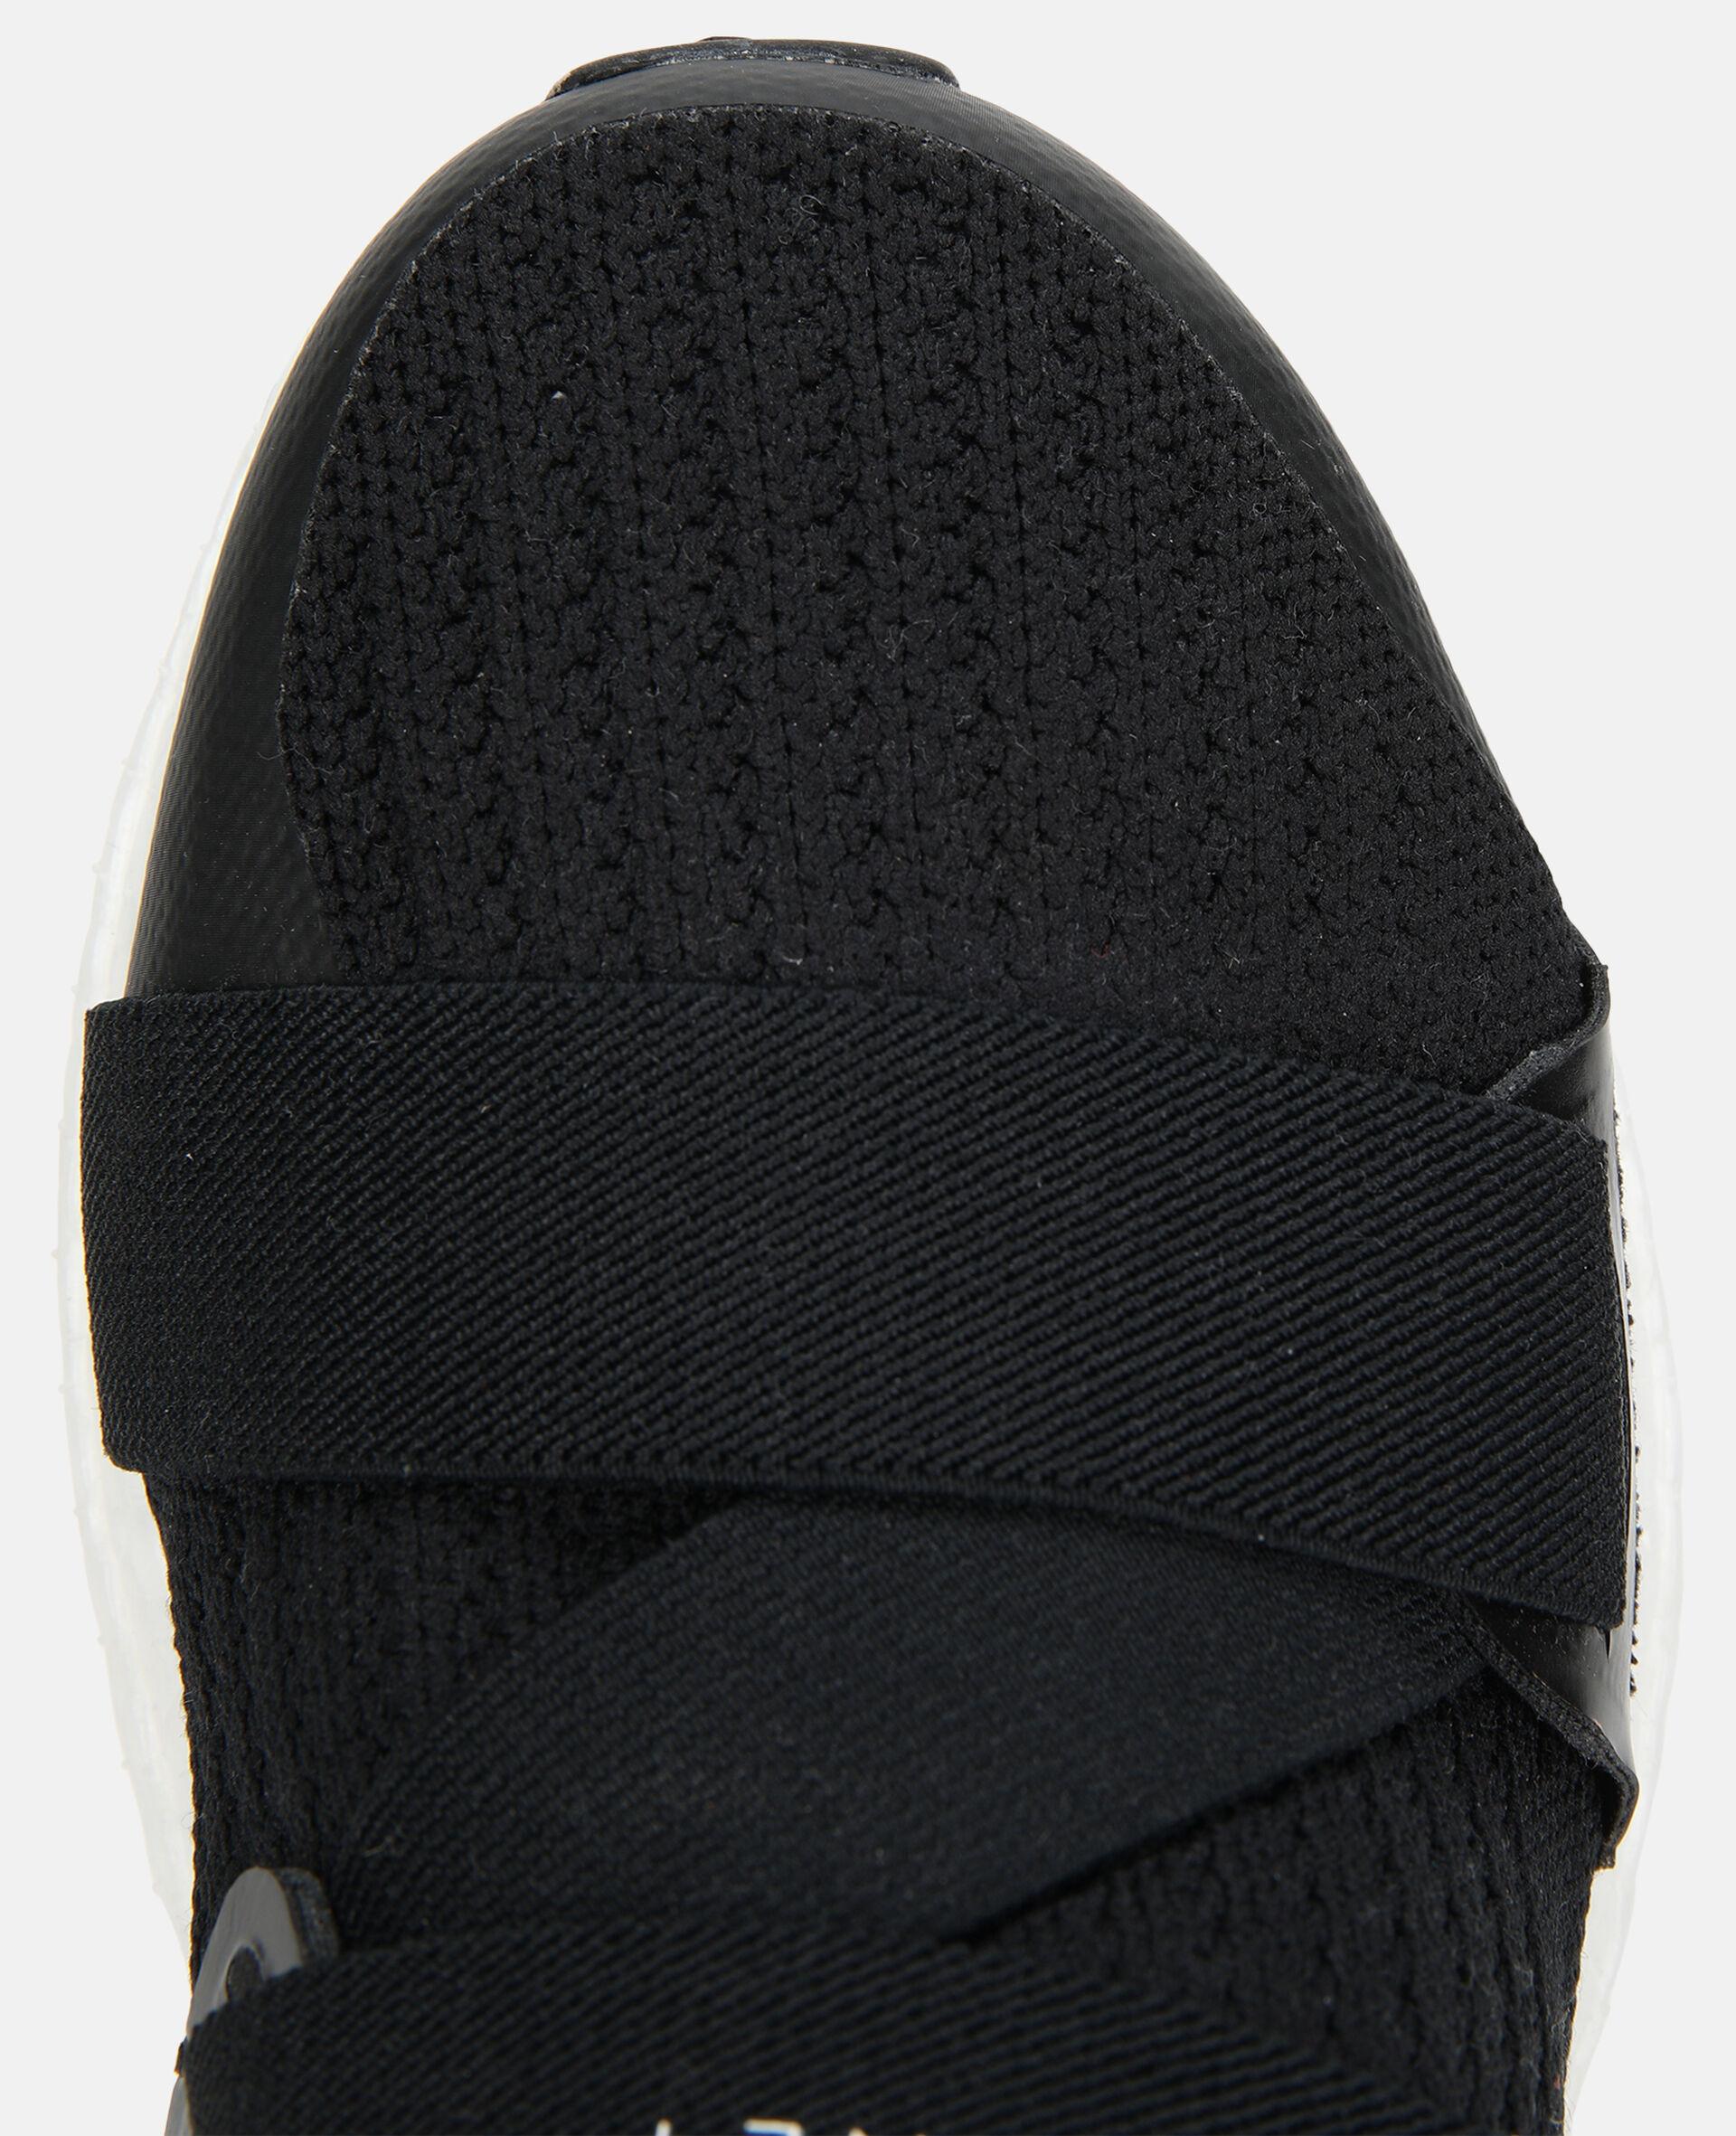 Black Ultraboost X Sneakers-Black-large image number 3